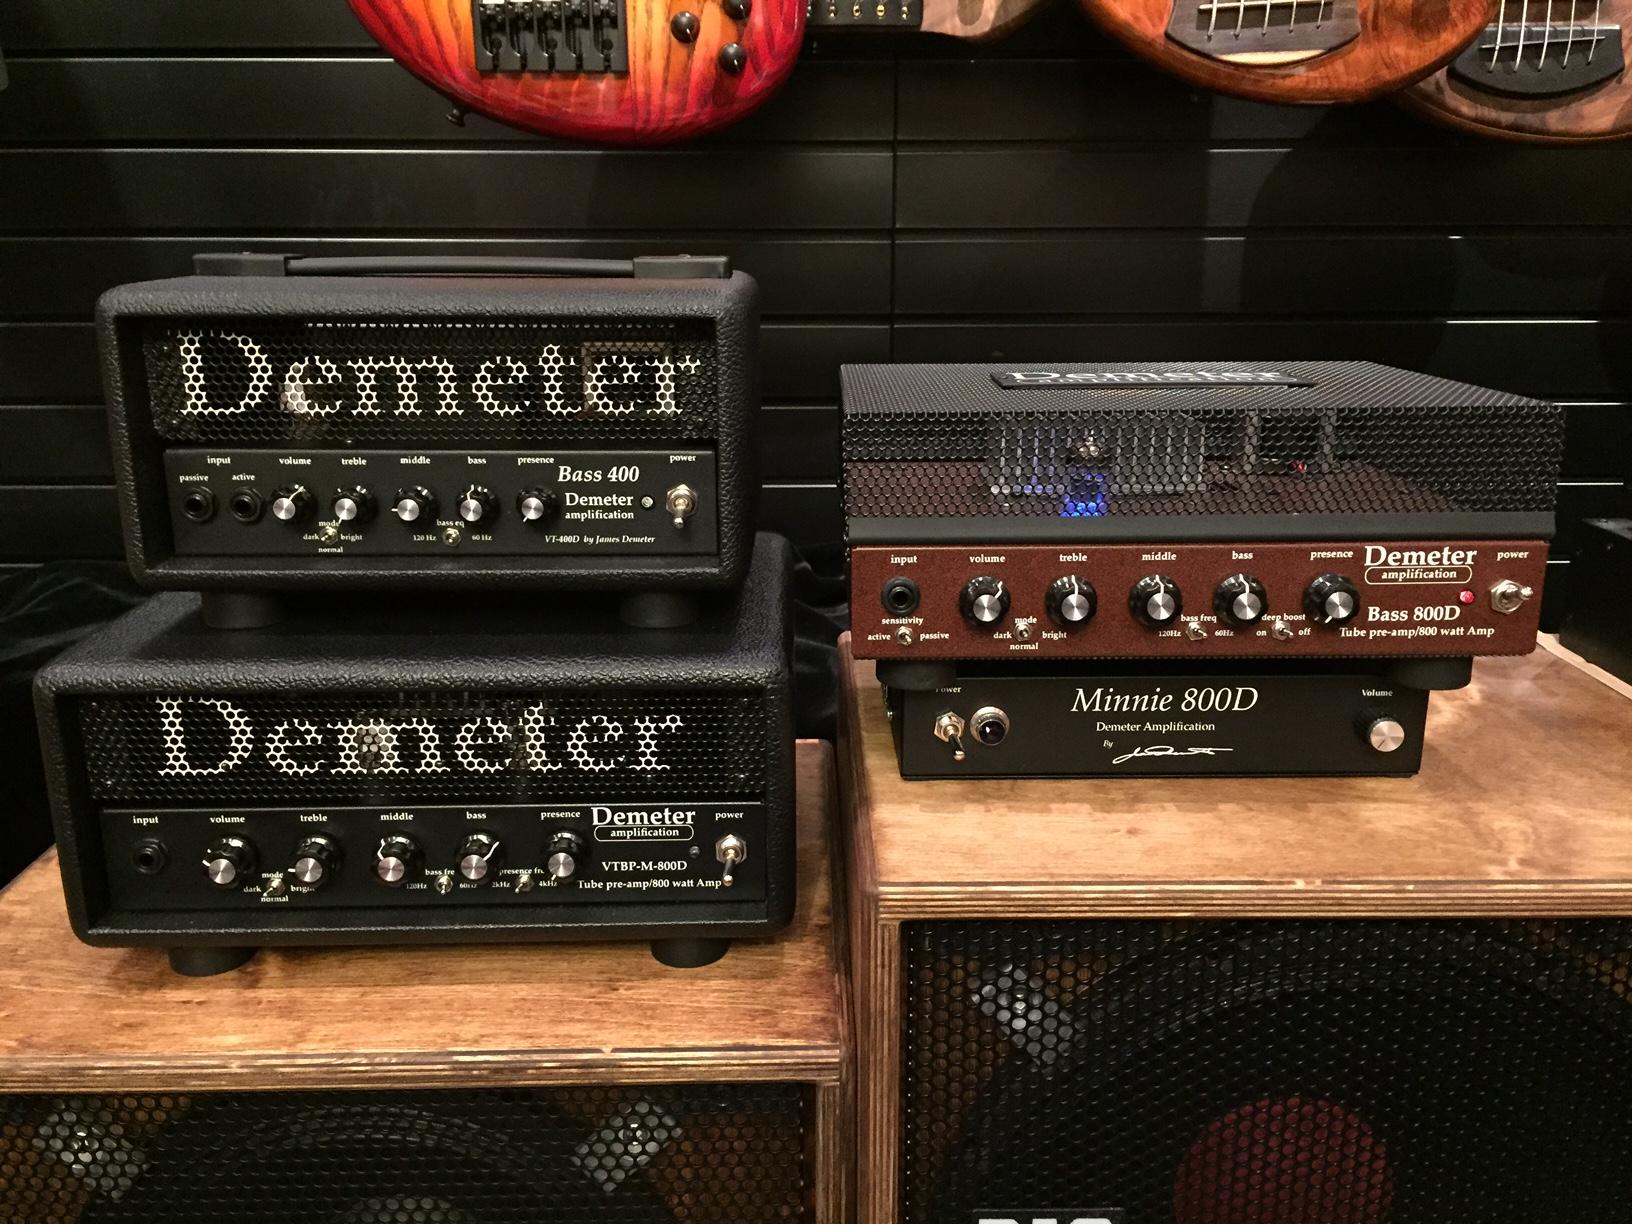 Demeter_amp_front